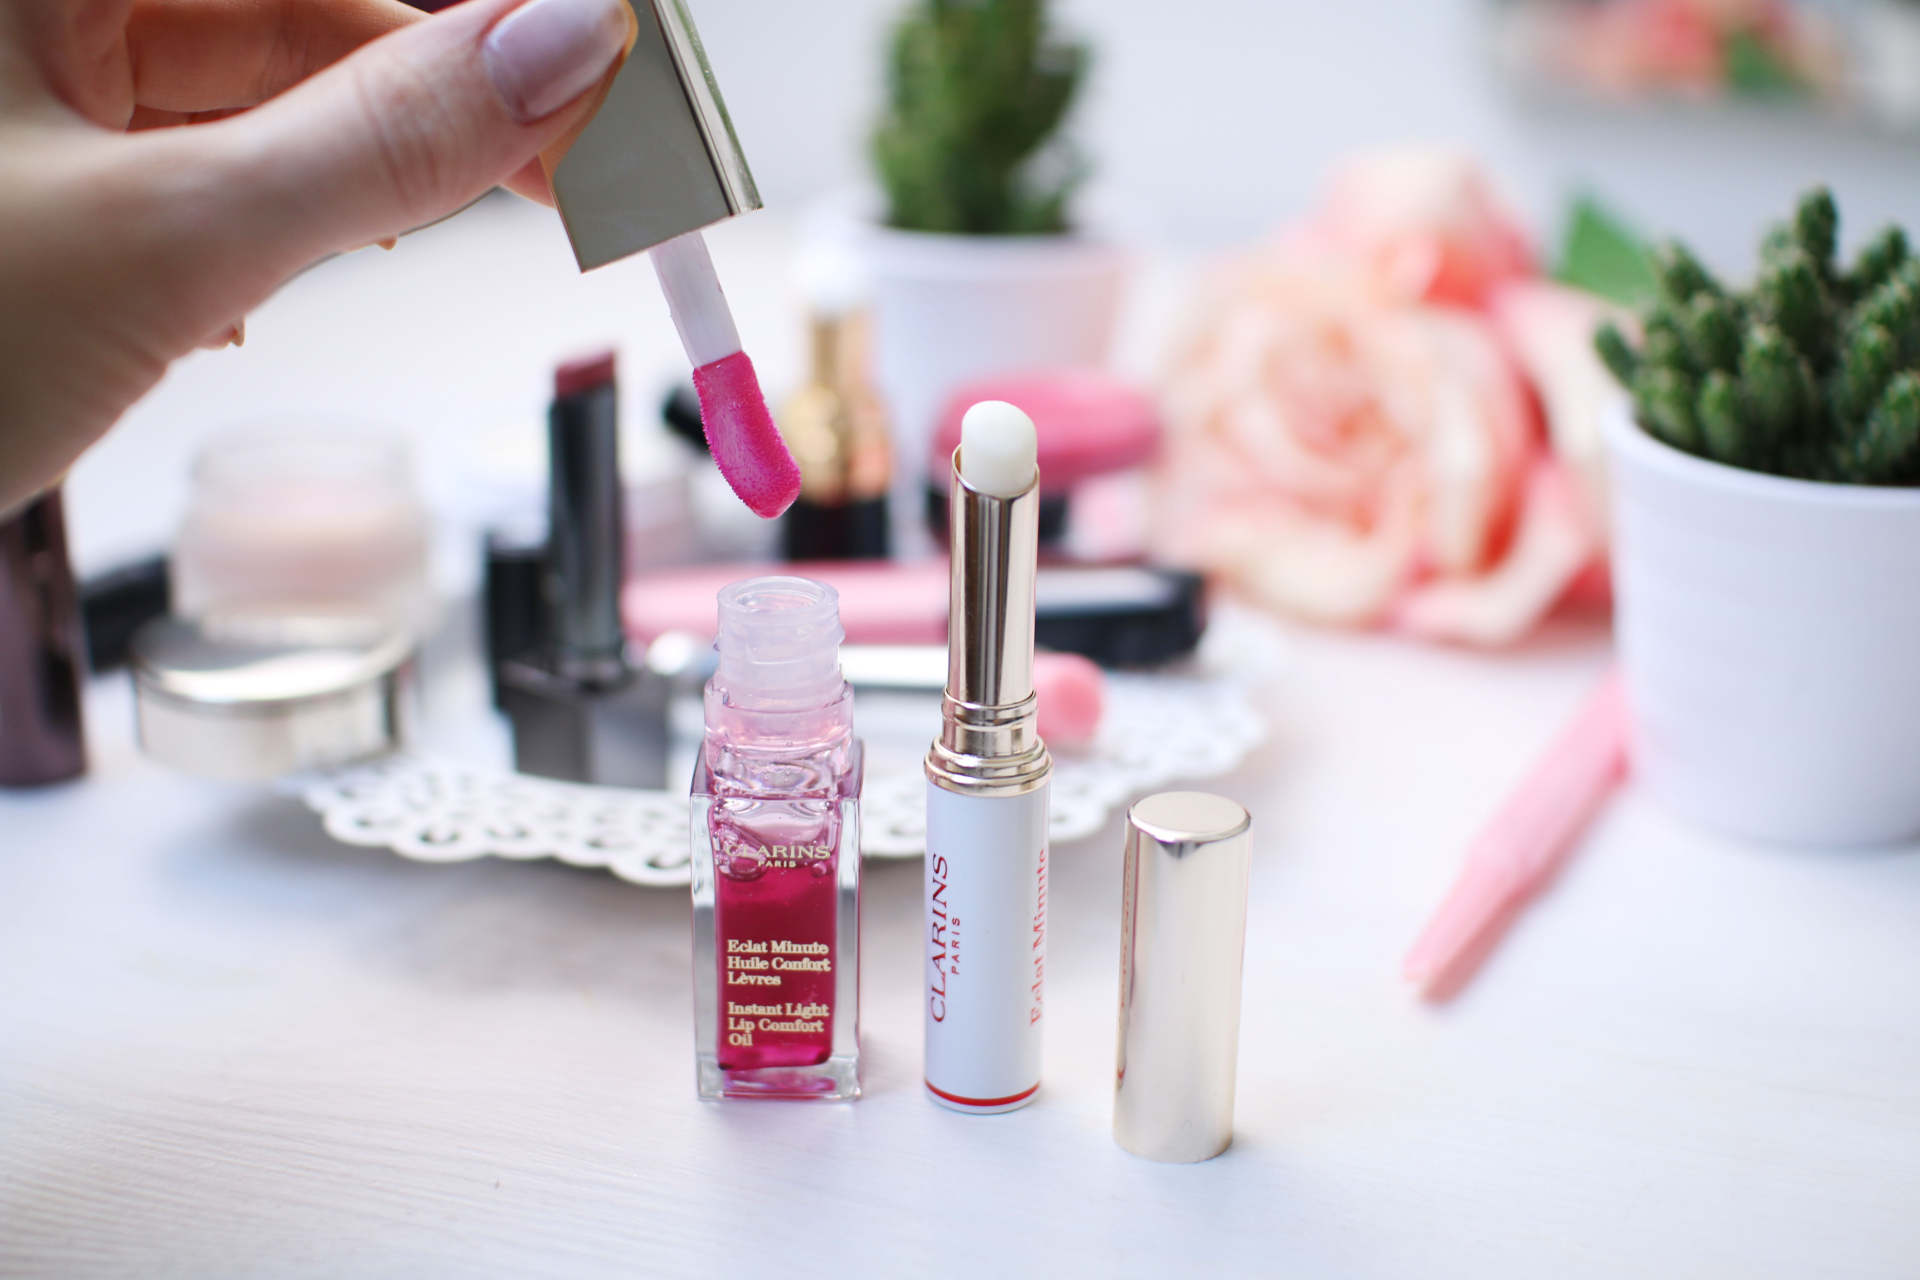 clarins luxury lip balm comparison inthefrow